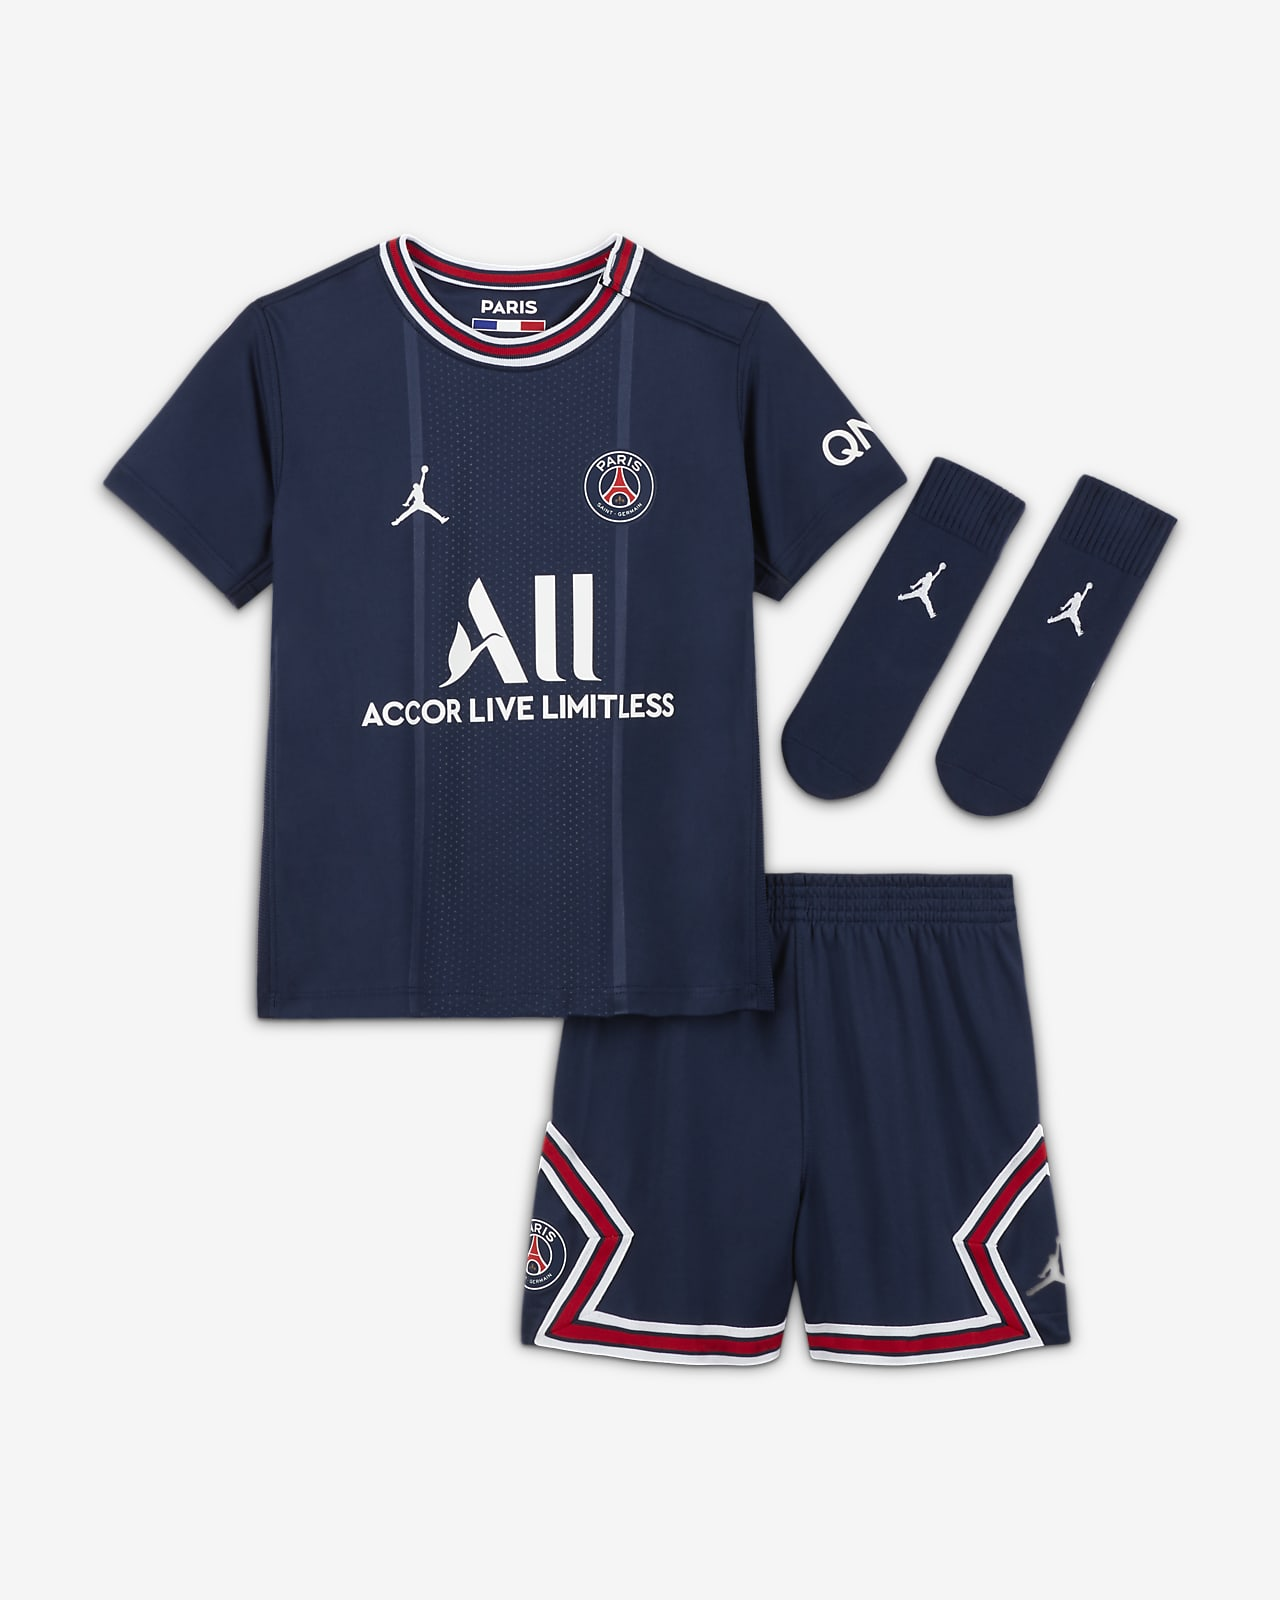 Paris Saint-Germain 2021/22 İç Saha Bebek Futbol Forması